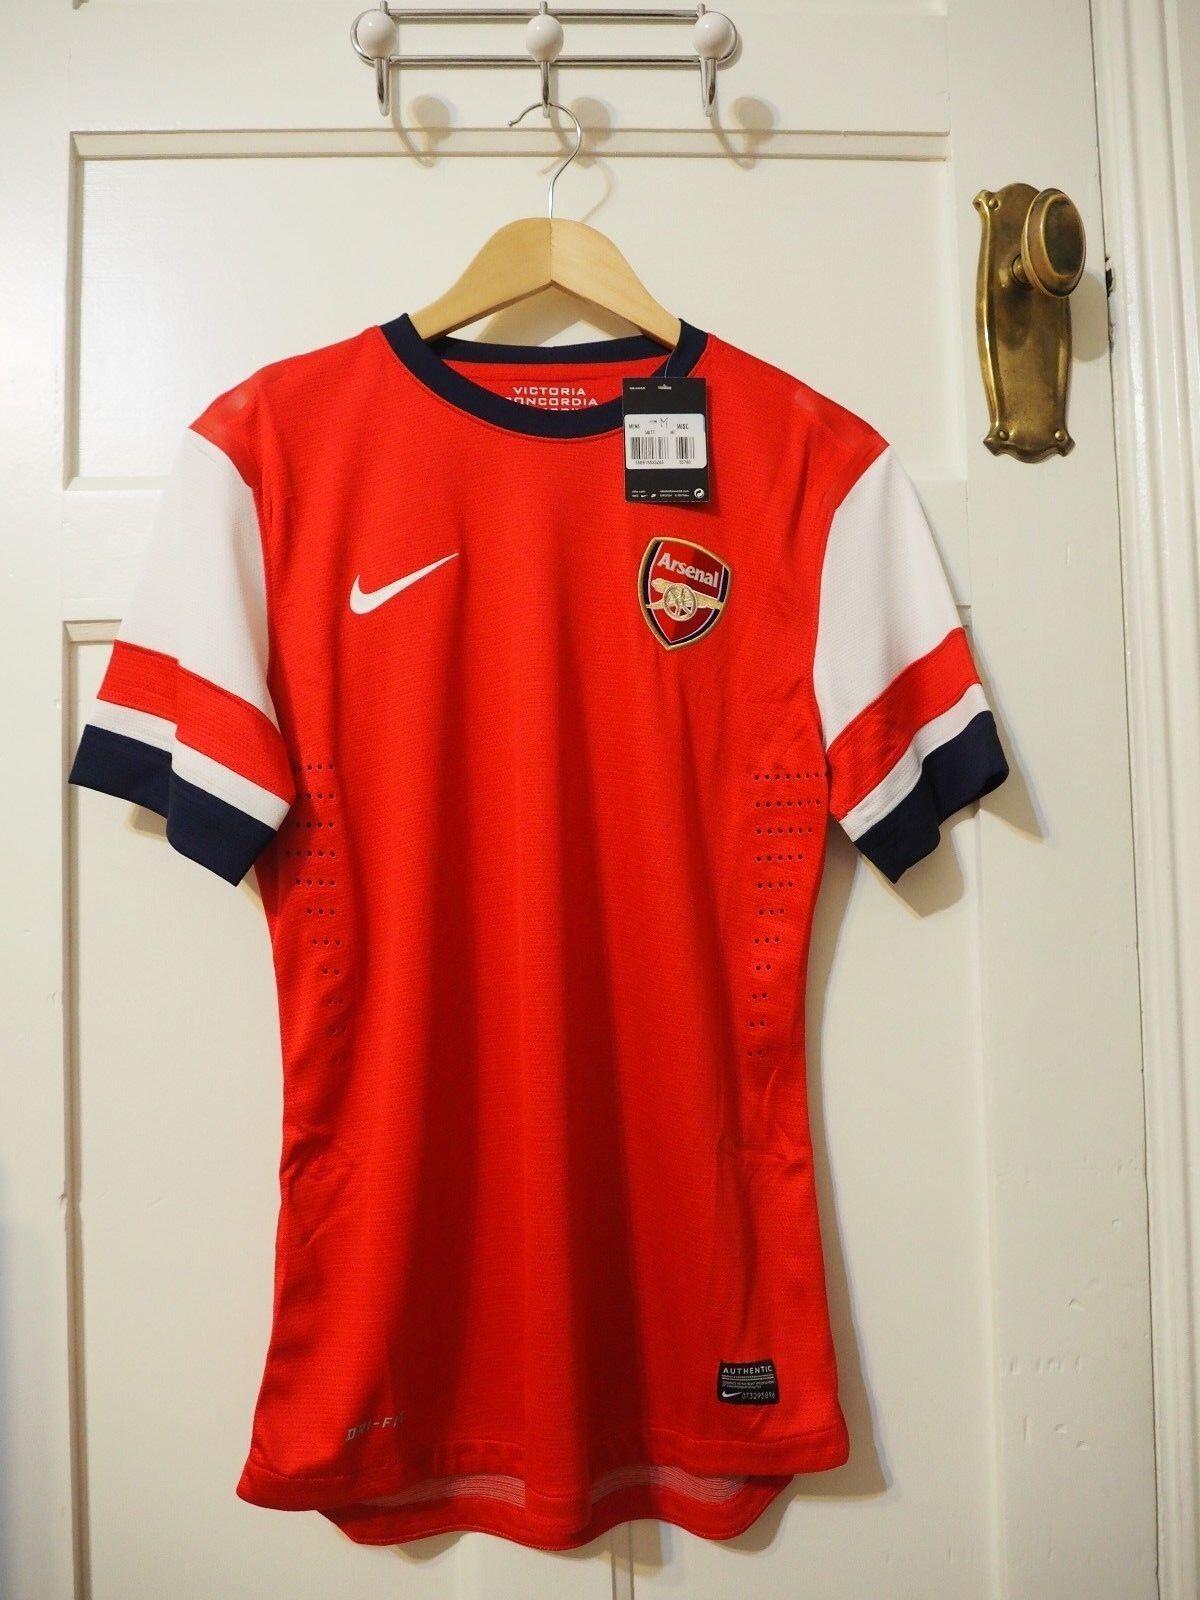 Arsenal Nike Home Camisa Medio 2012-2014 jugadores problema-Bnwt